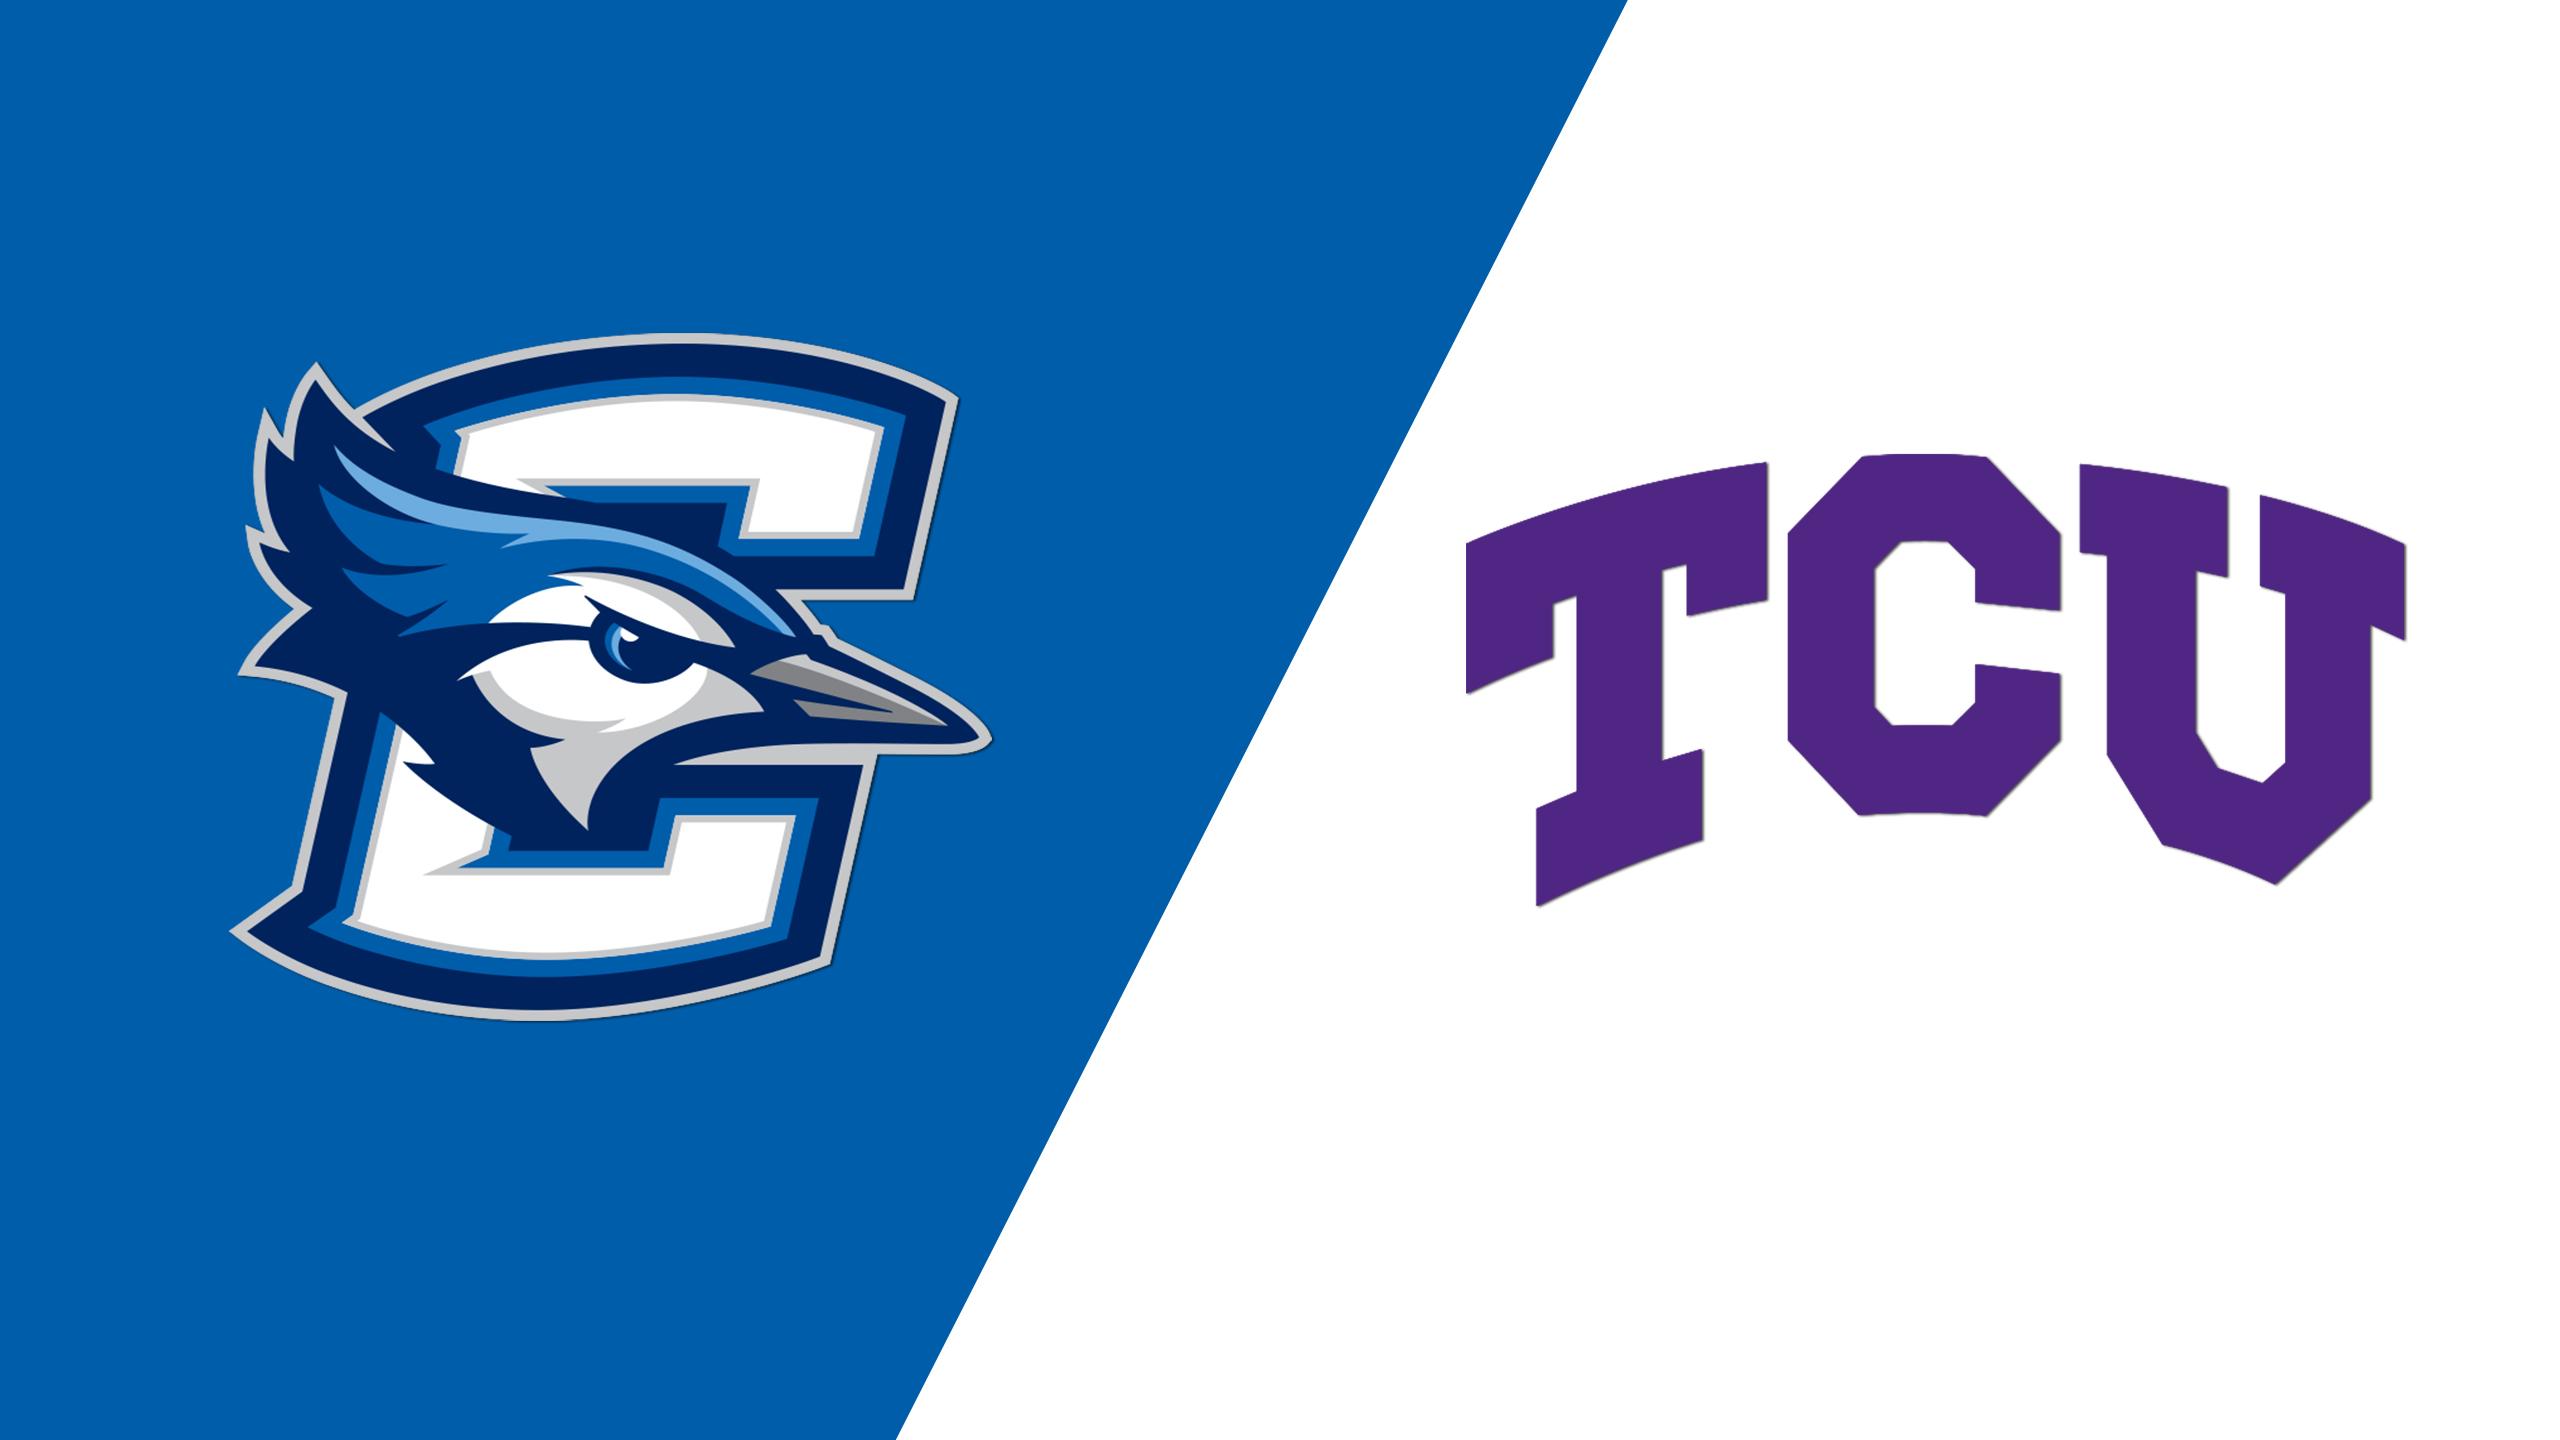 #2 Creighton vs. #1 TCU (Quarterfinal #2) (NIT)